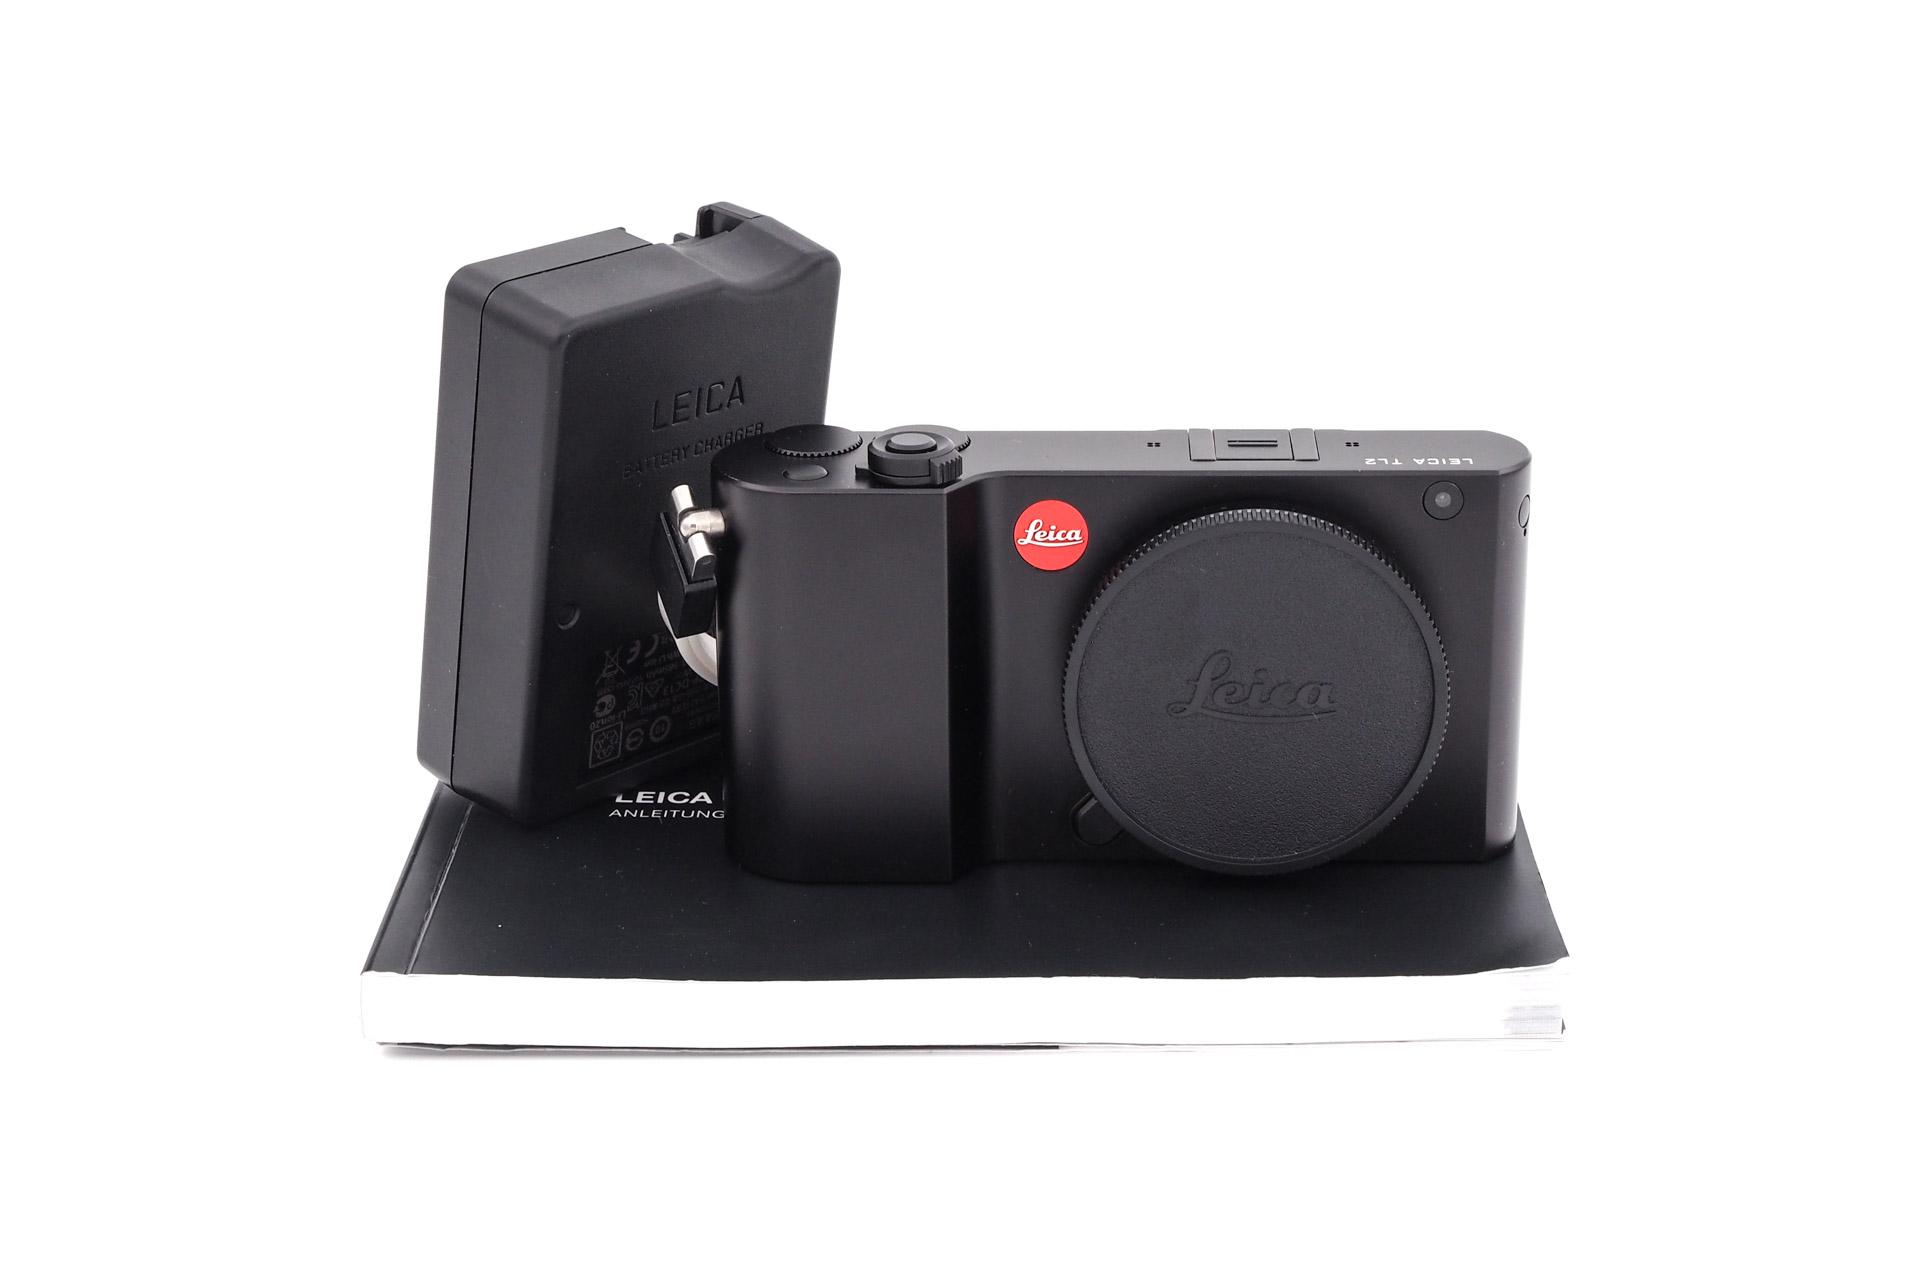 Leica TL-2 black